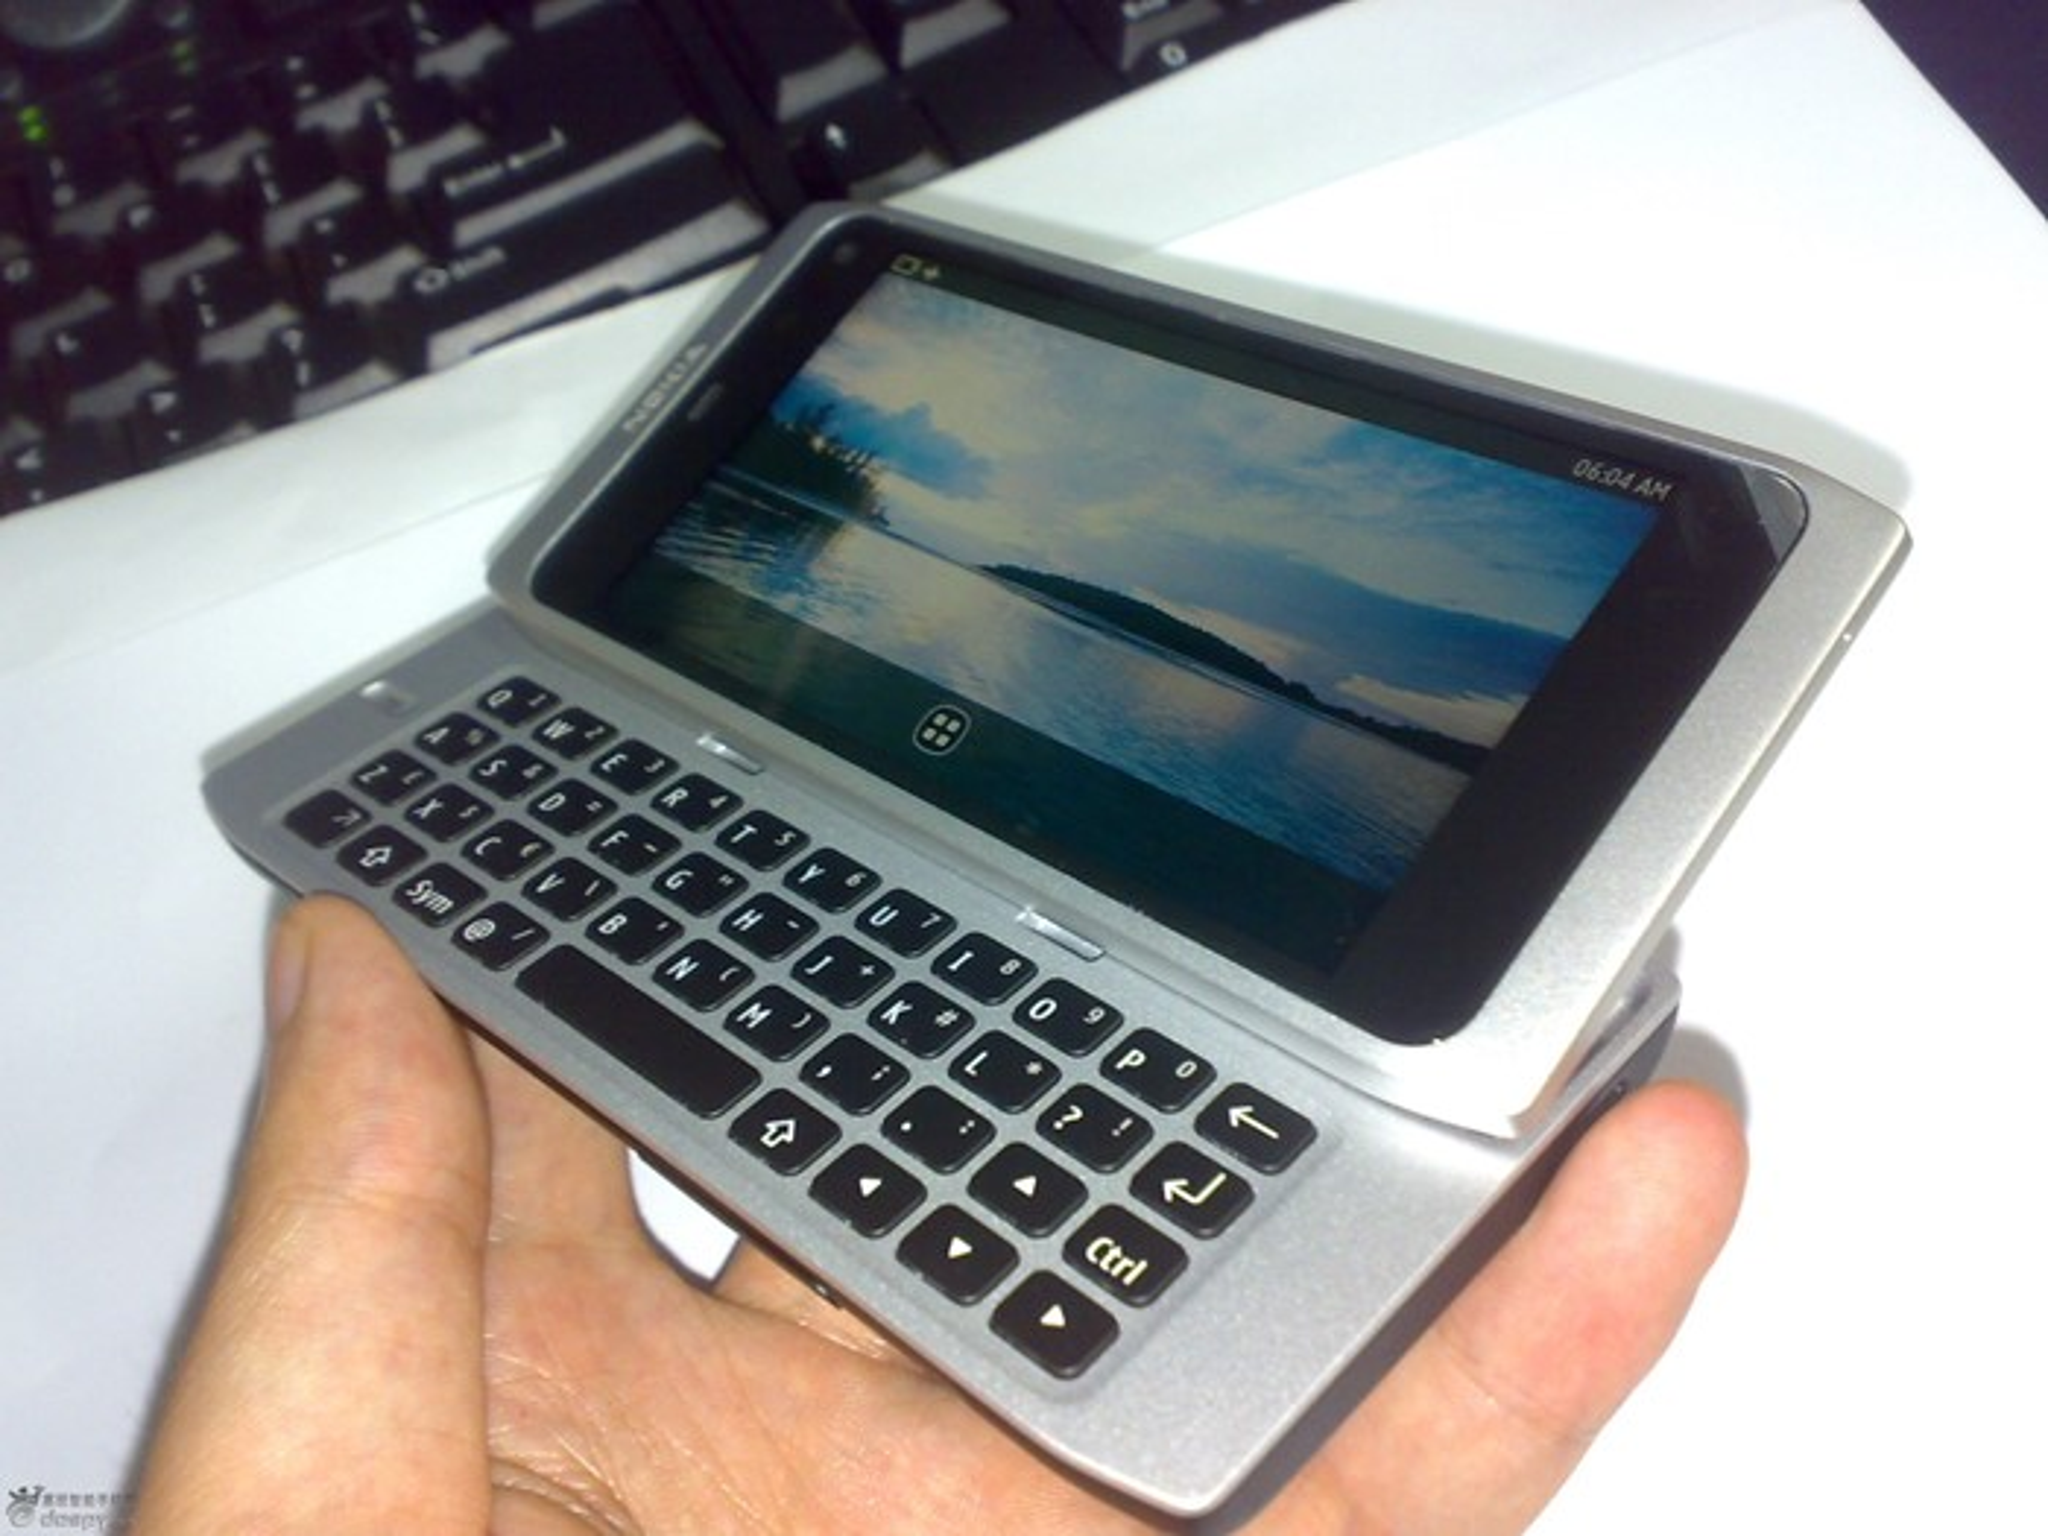 Protótipo no Nokia N9